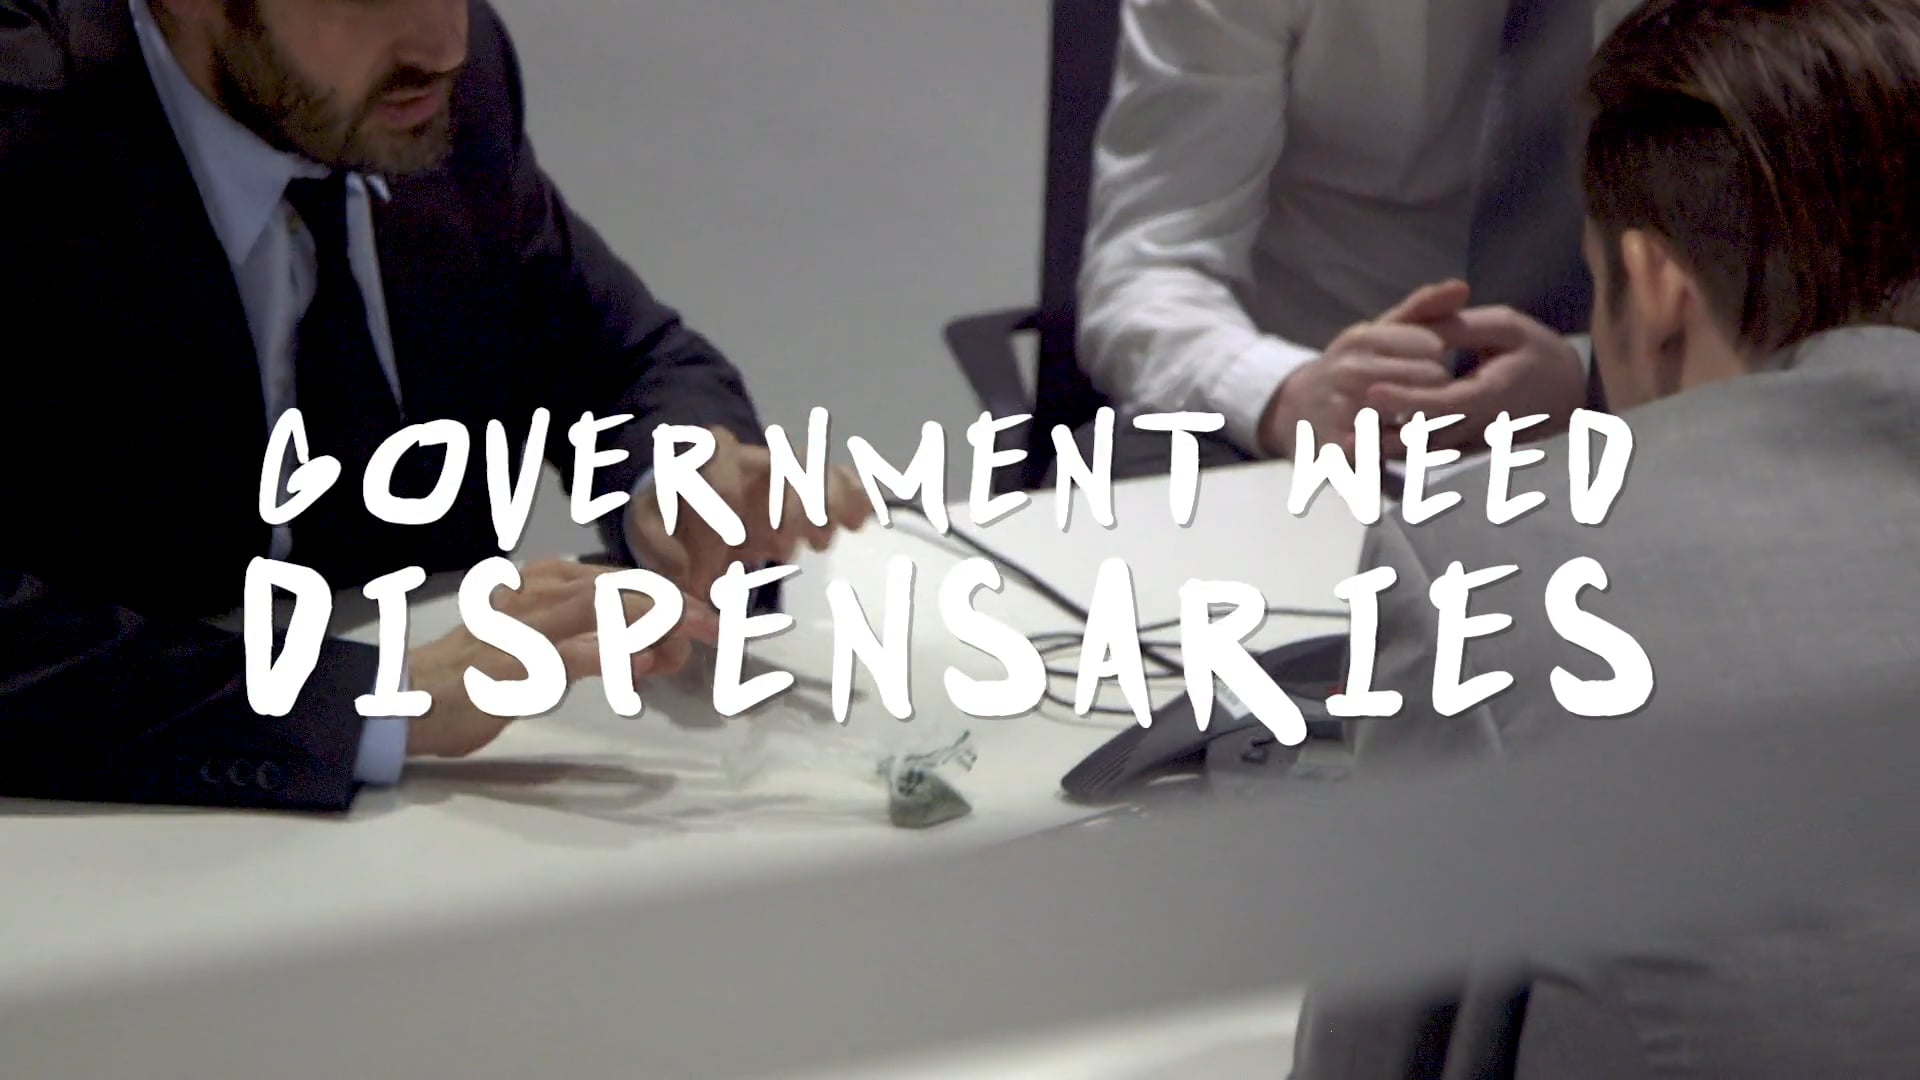 TORONTOPIA - GOVERNMENT WEED DIPENSARIES